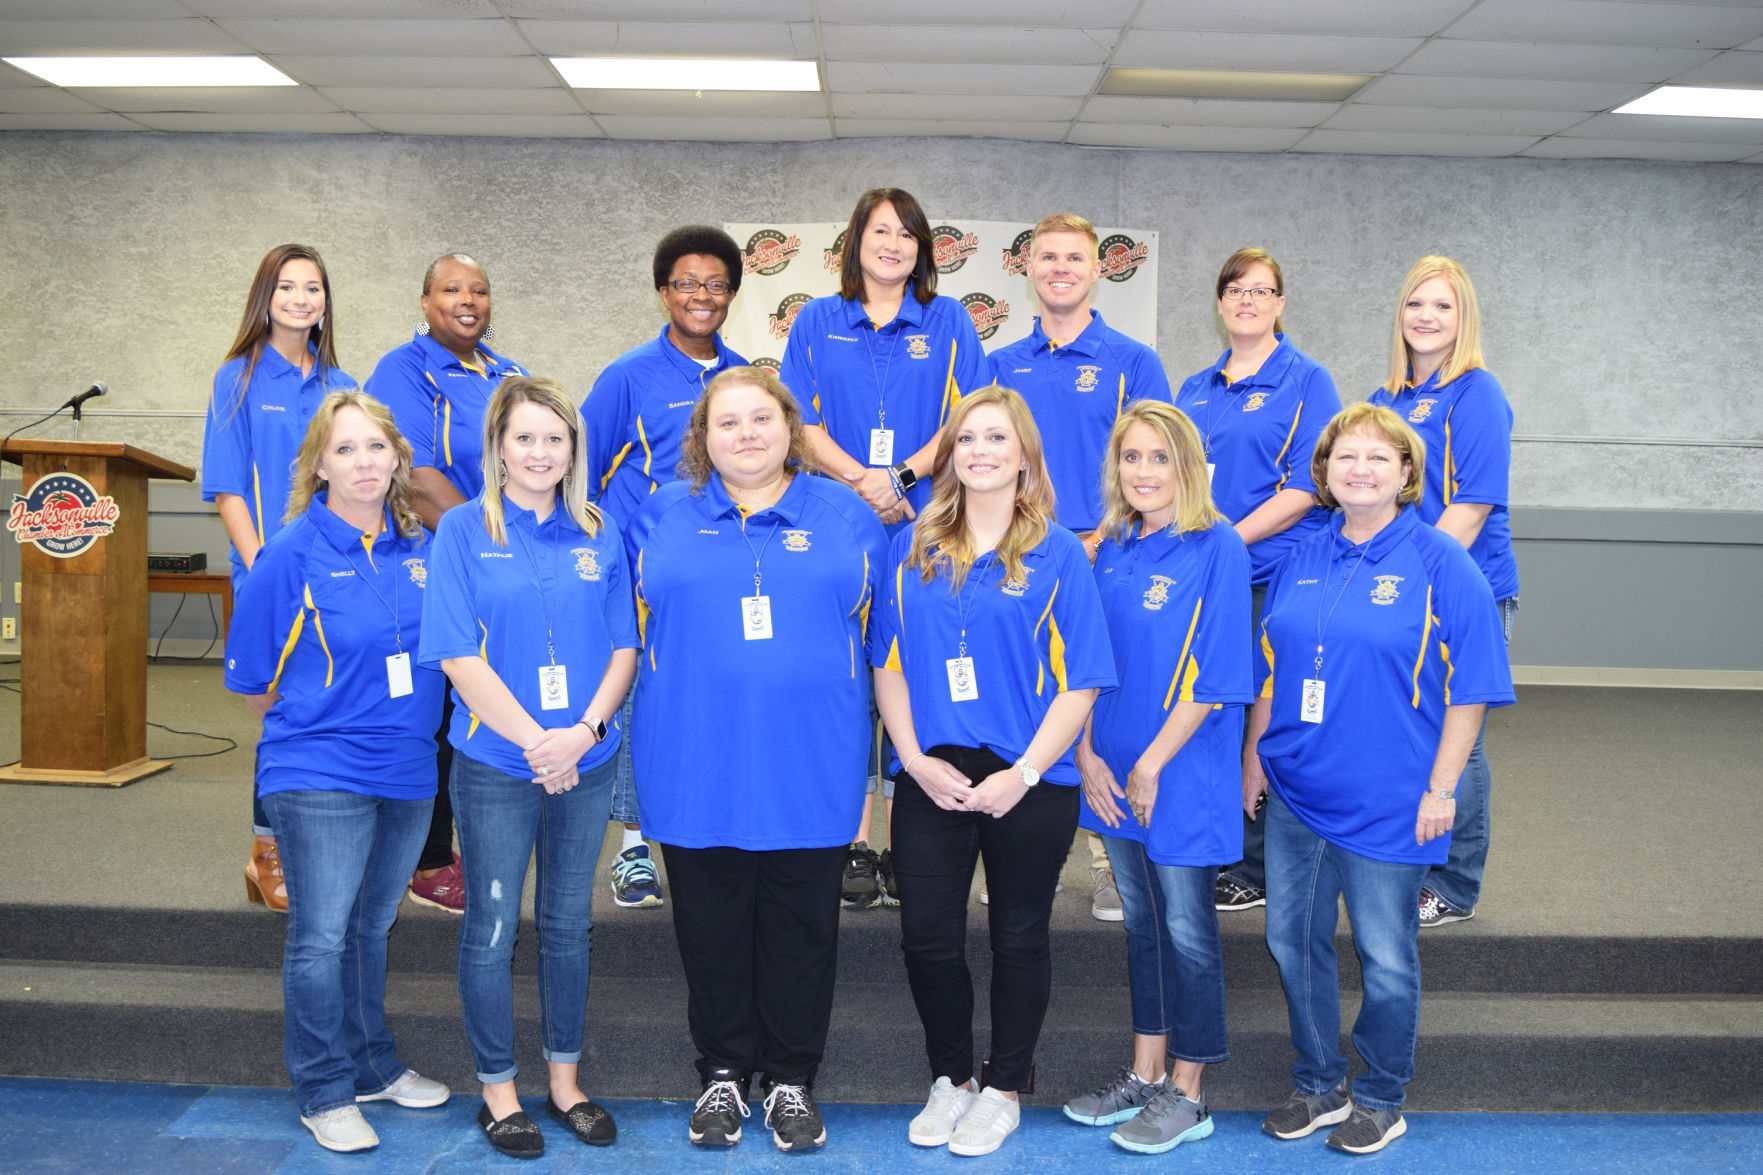 Leadership Jacksonville Institute begins activities with new class | Jacksonville Progress